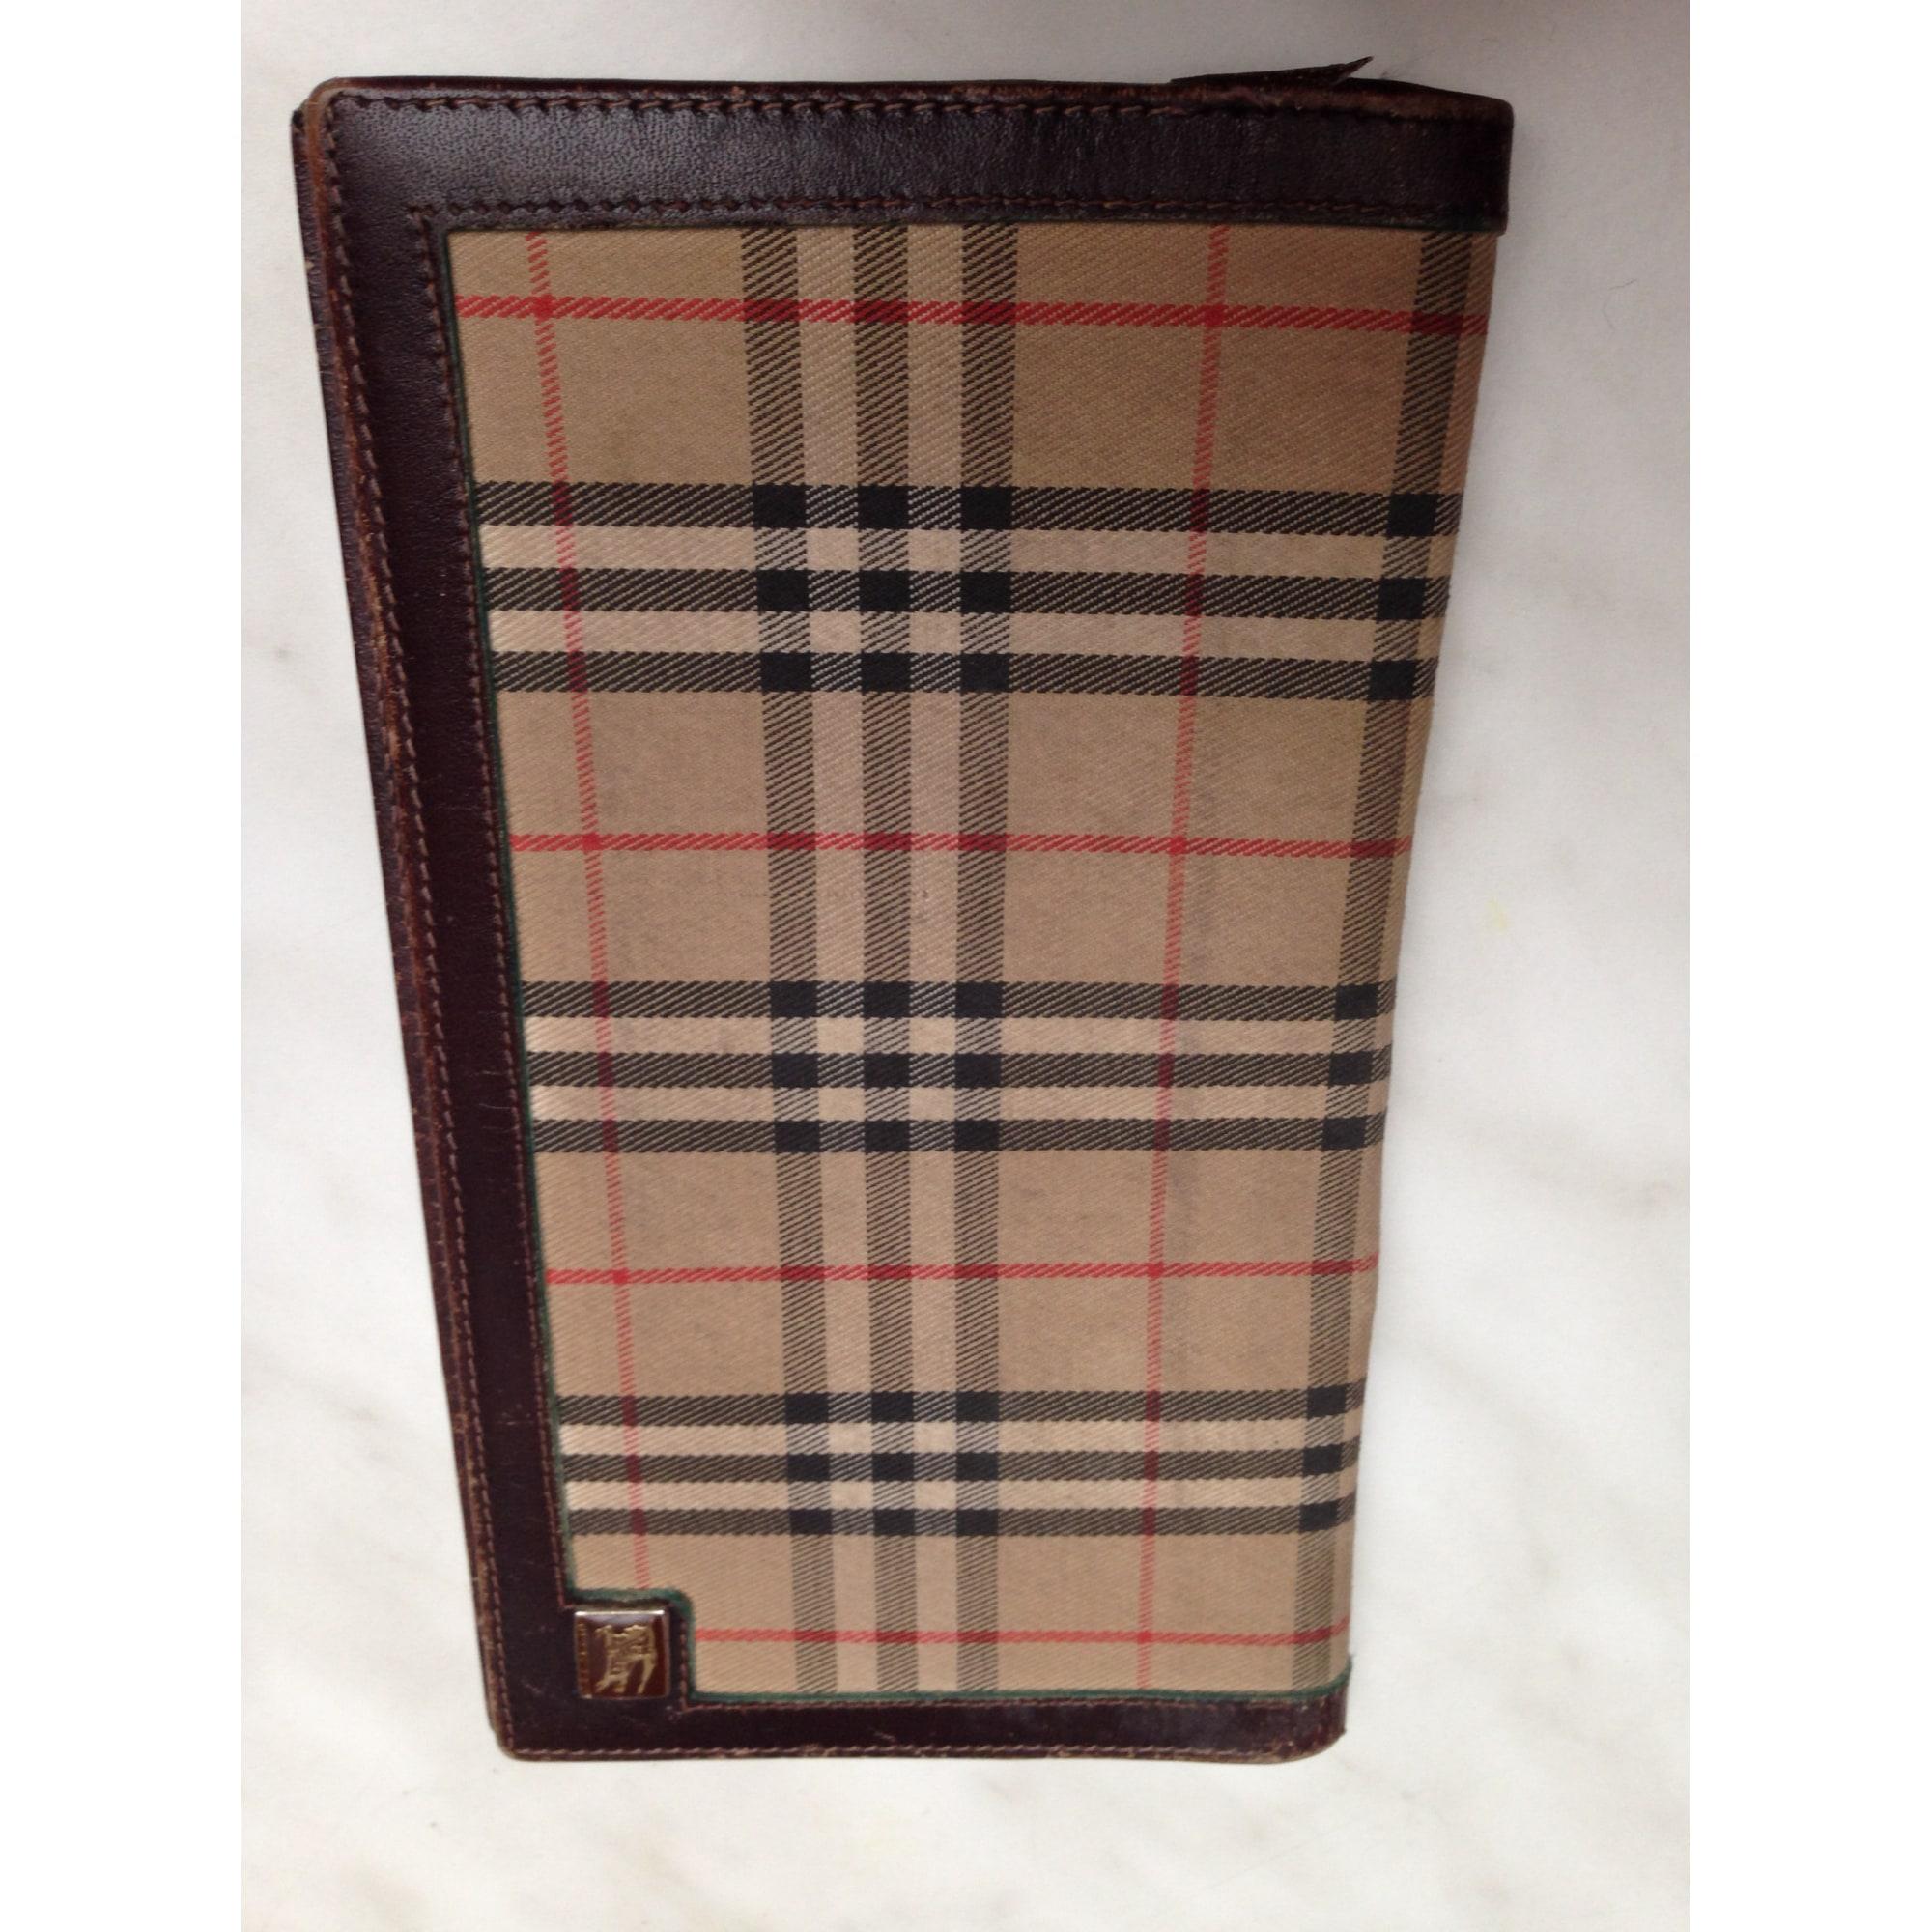 Porte-chéquier BURBERRY marron vendu par Blandine 73551384 - 3543906 56842ac39ed